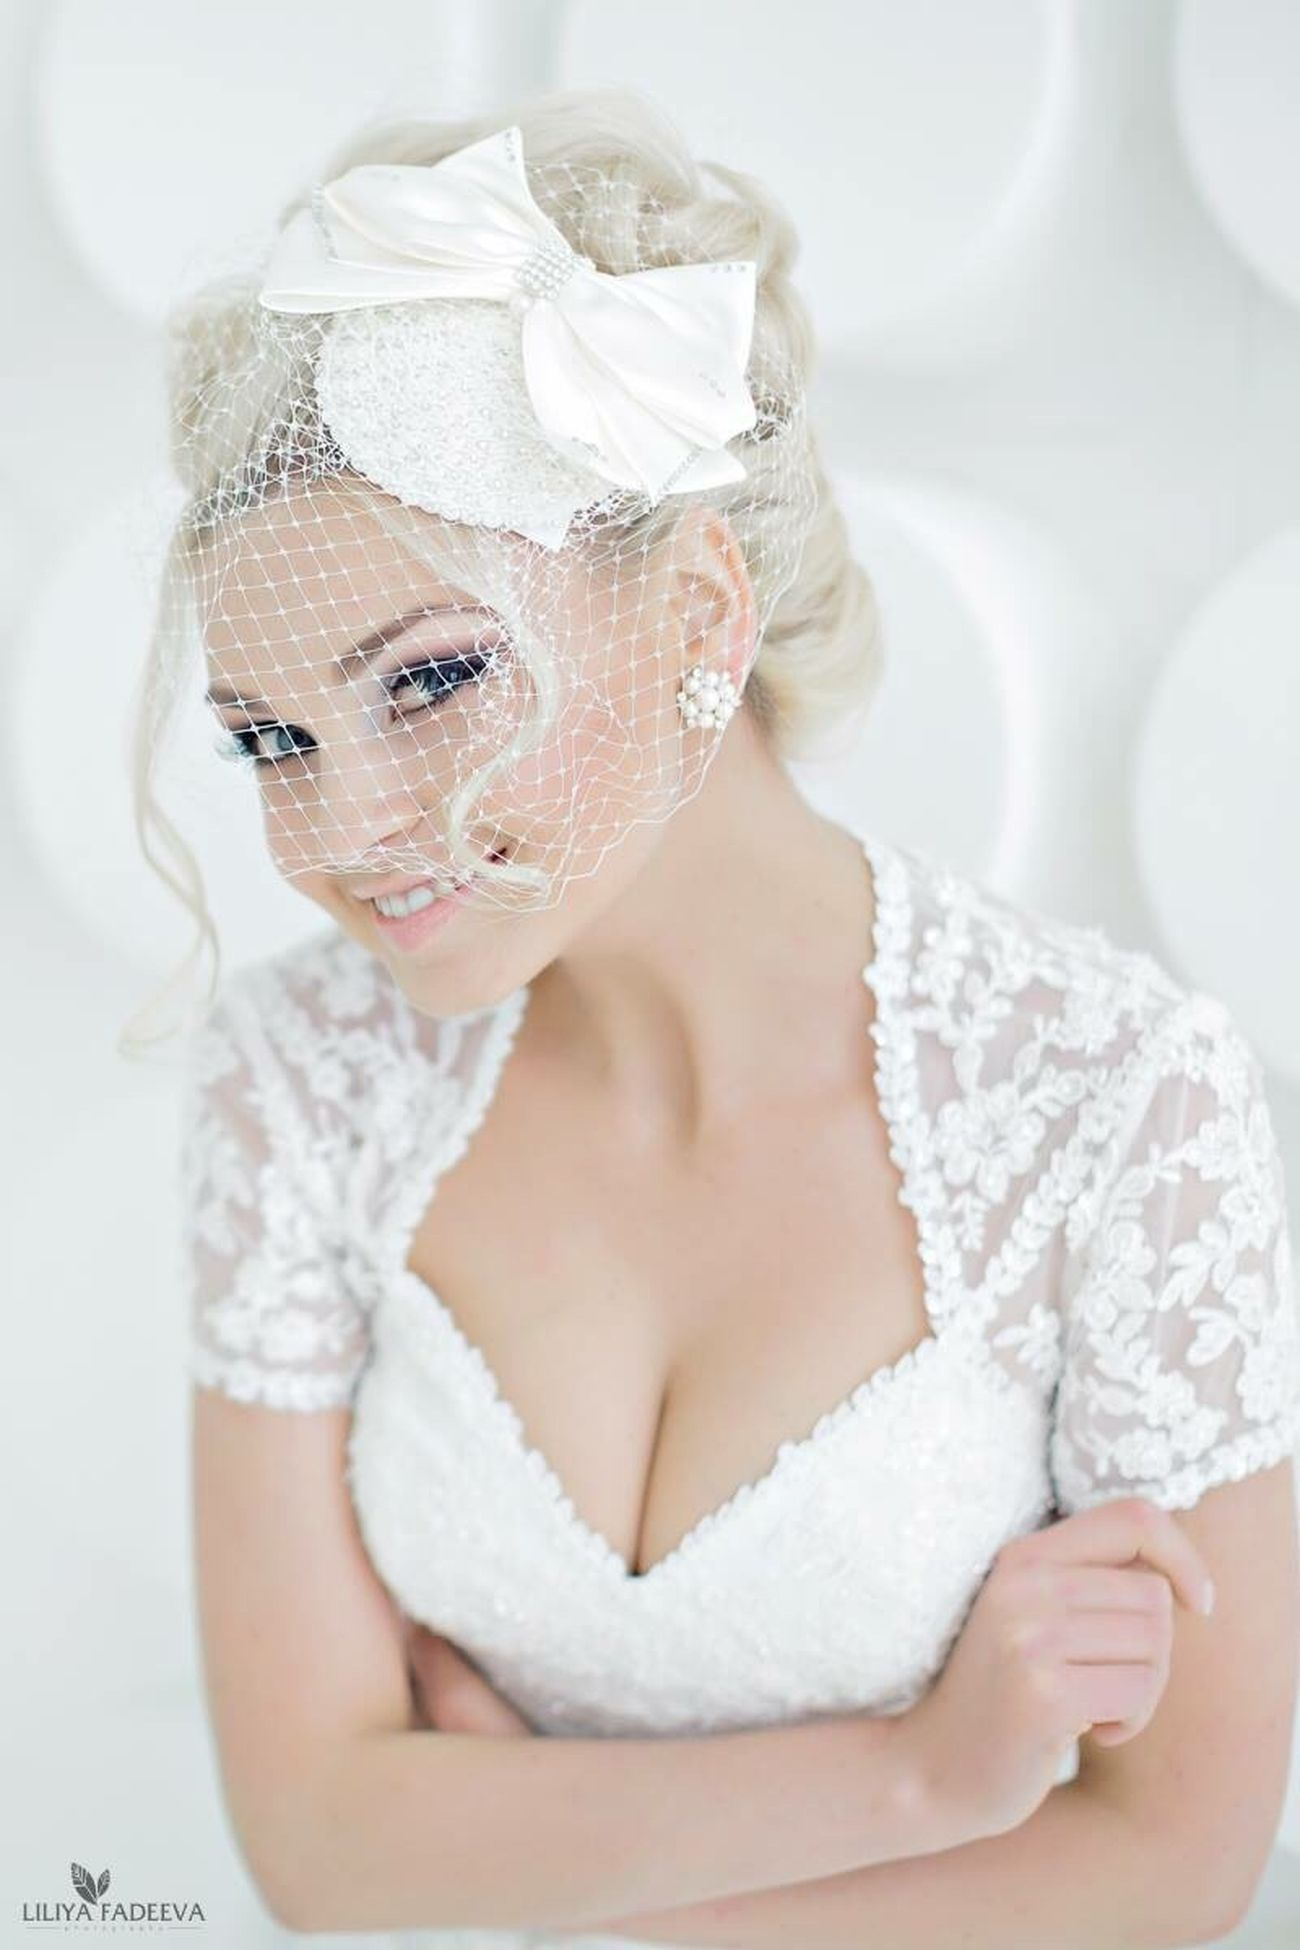 Wedding2015 Weddingdress Novia2015 Weddingdetails Weddinginitaly Weddinghair Fashion Hair Hairstylist Wedding Hairstyle